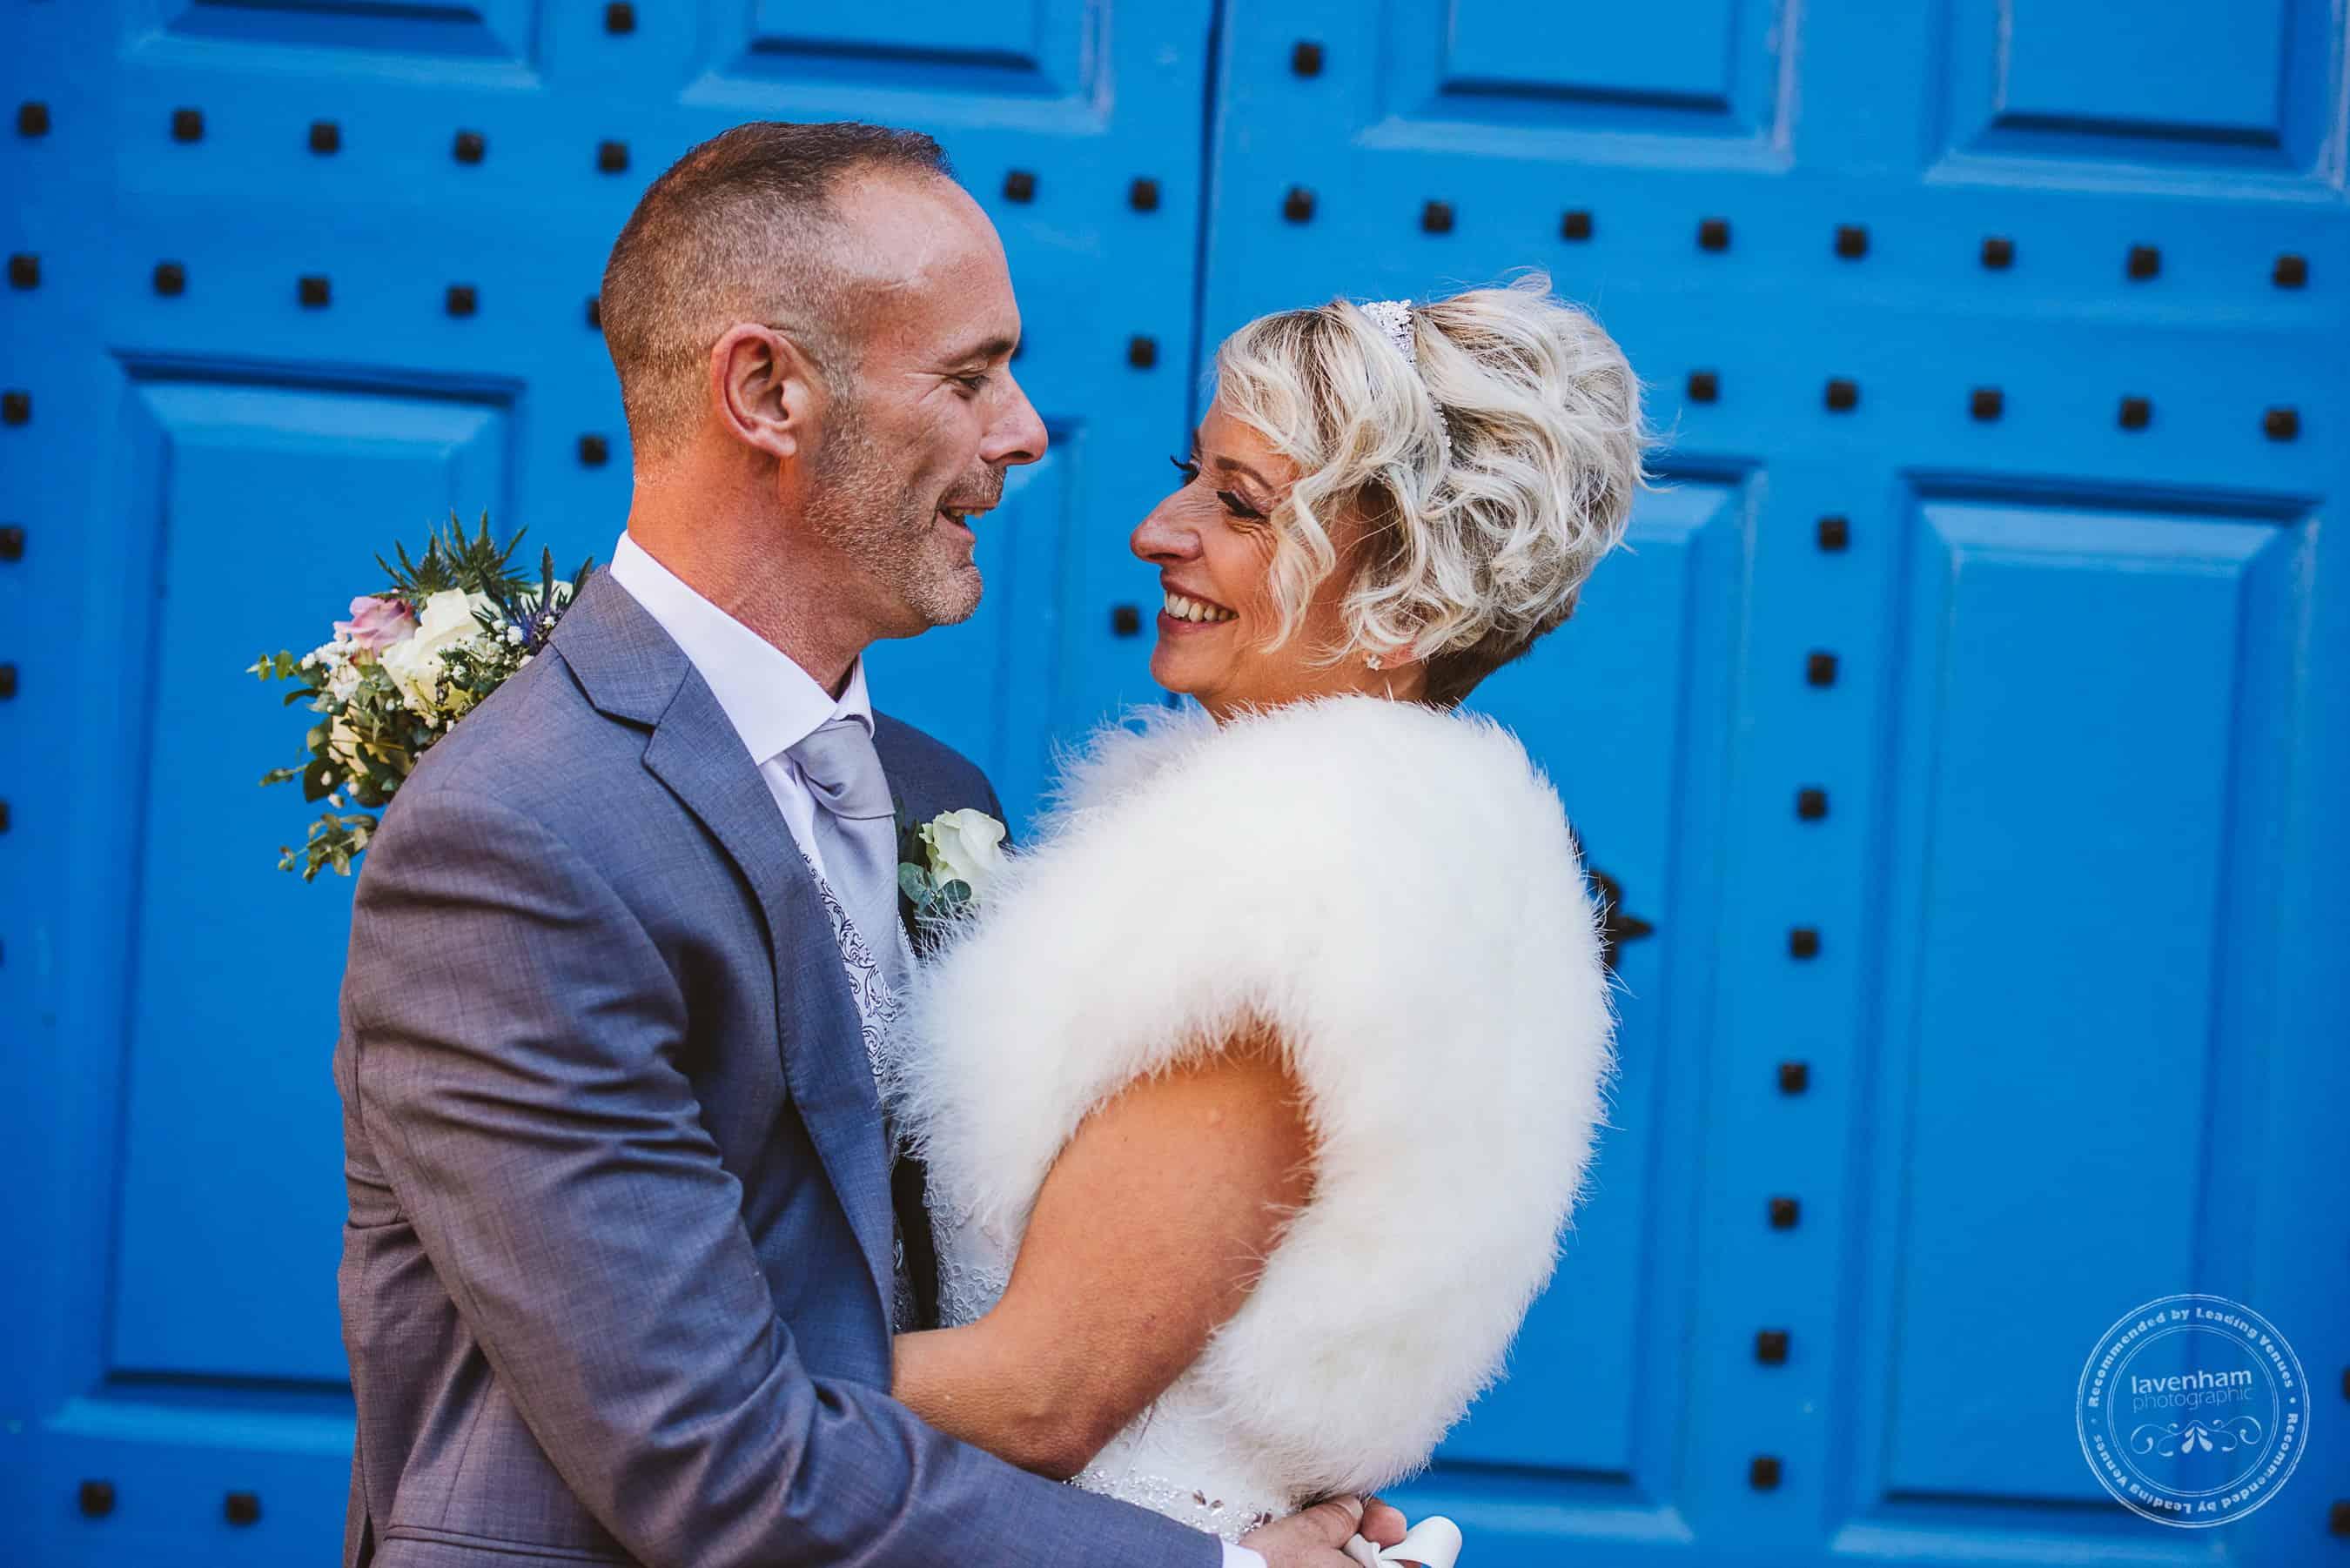 281018 Gosfield Hall Wedding Photography Lavenham Photographic 069